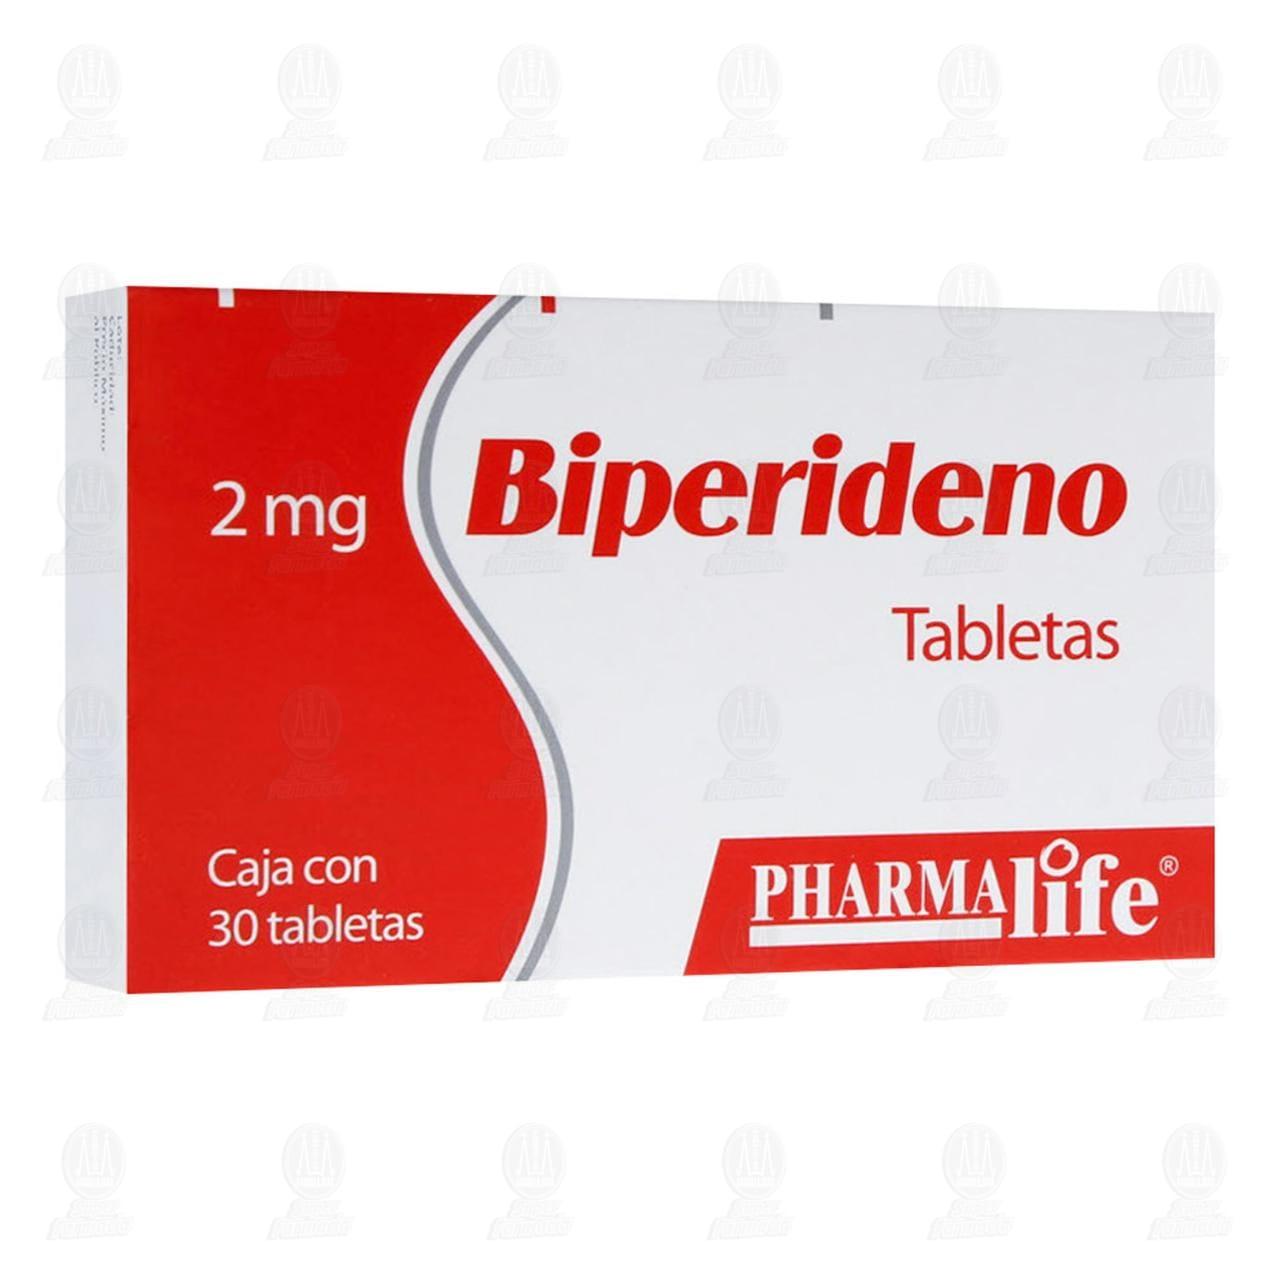 Comprar Biperideno 2mg 30 Tabletas Pharmalife en Farmacias Guadalajara